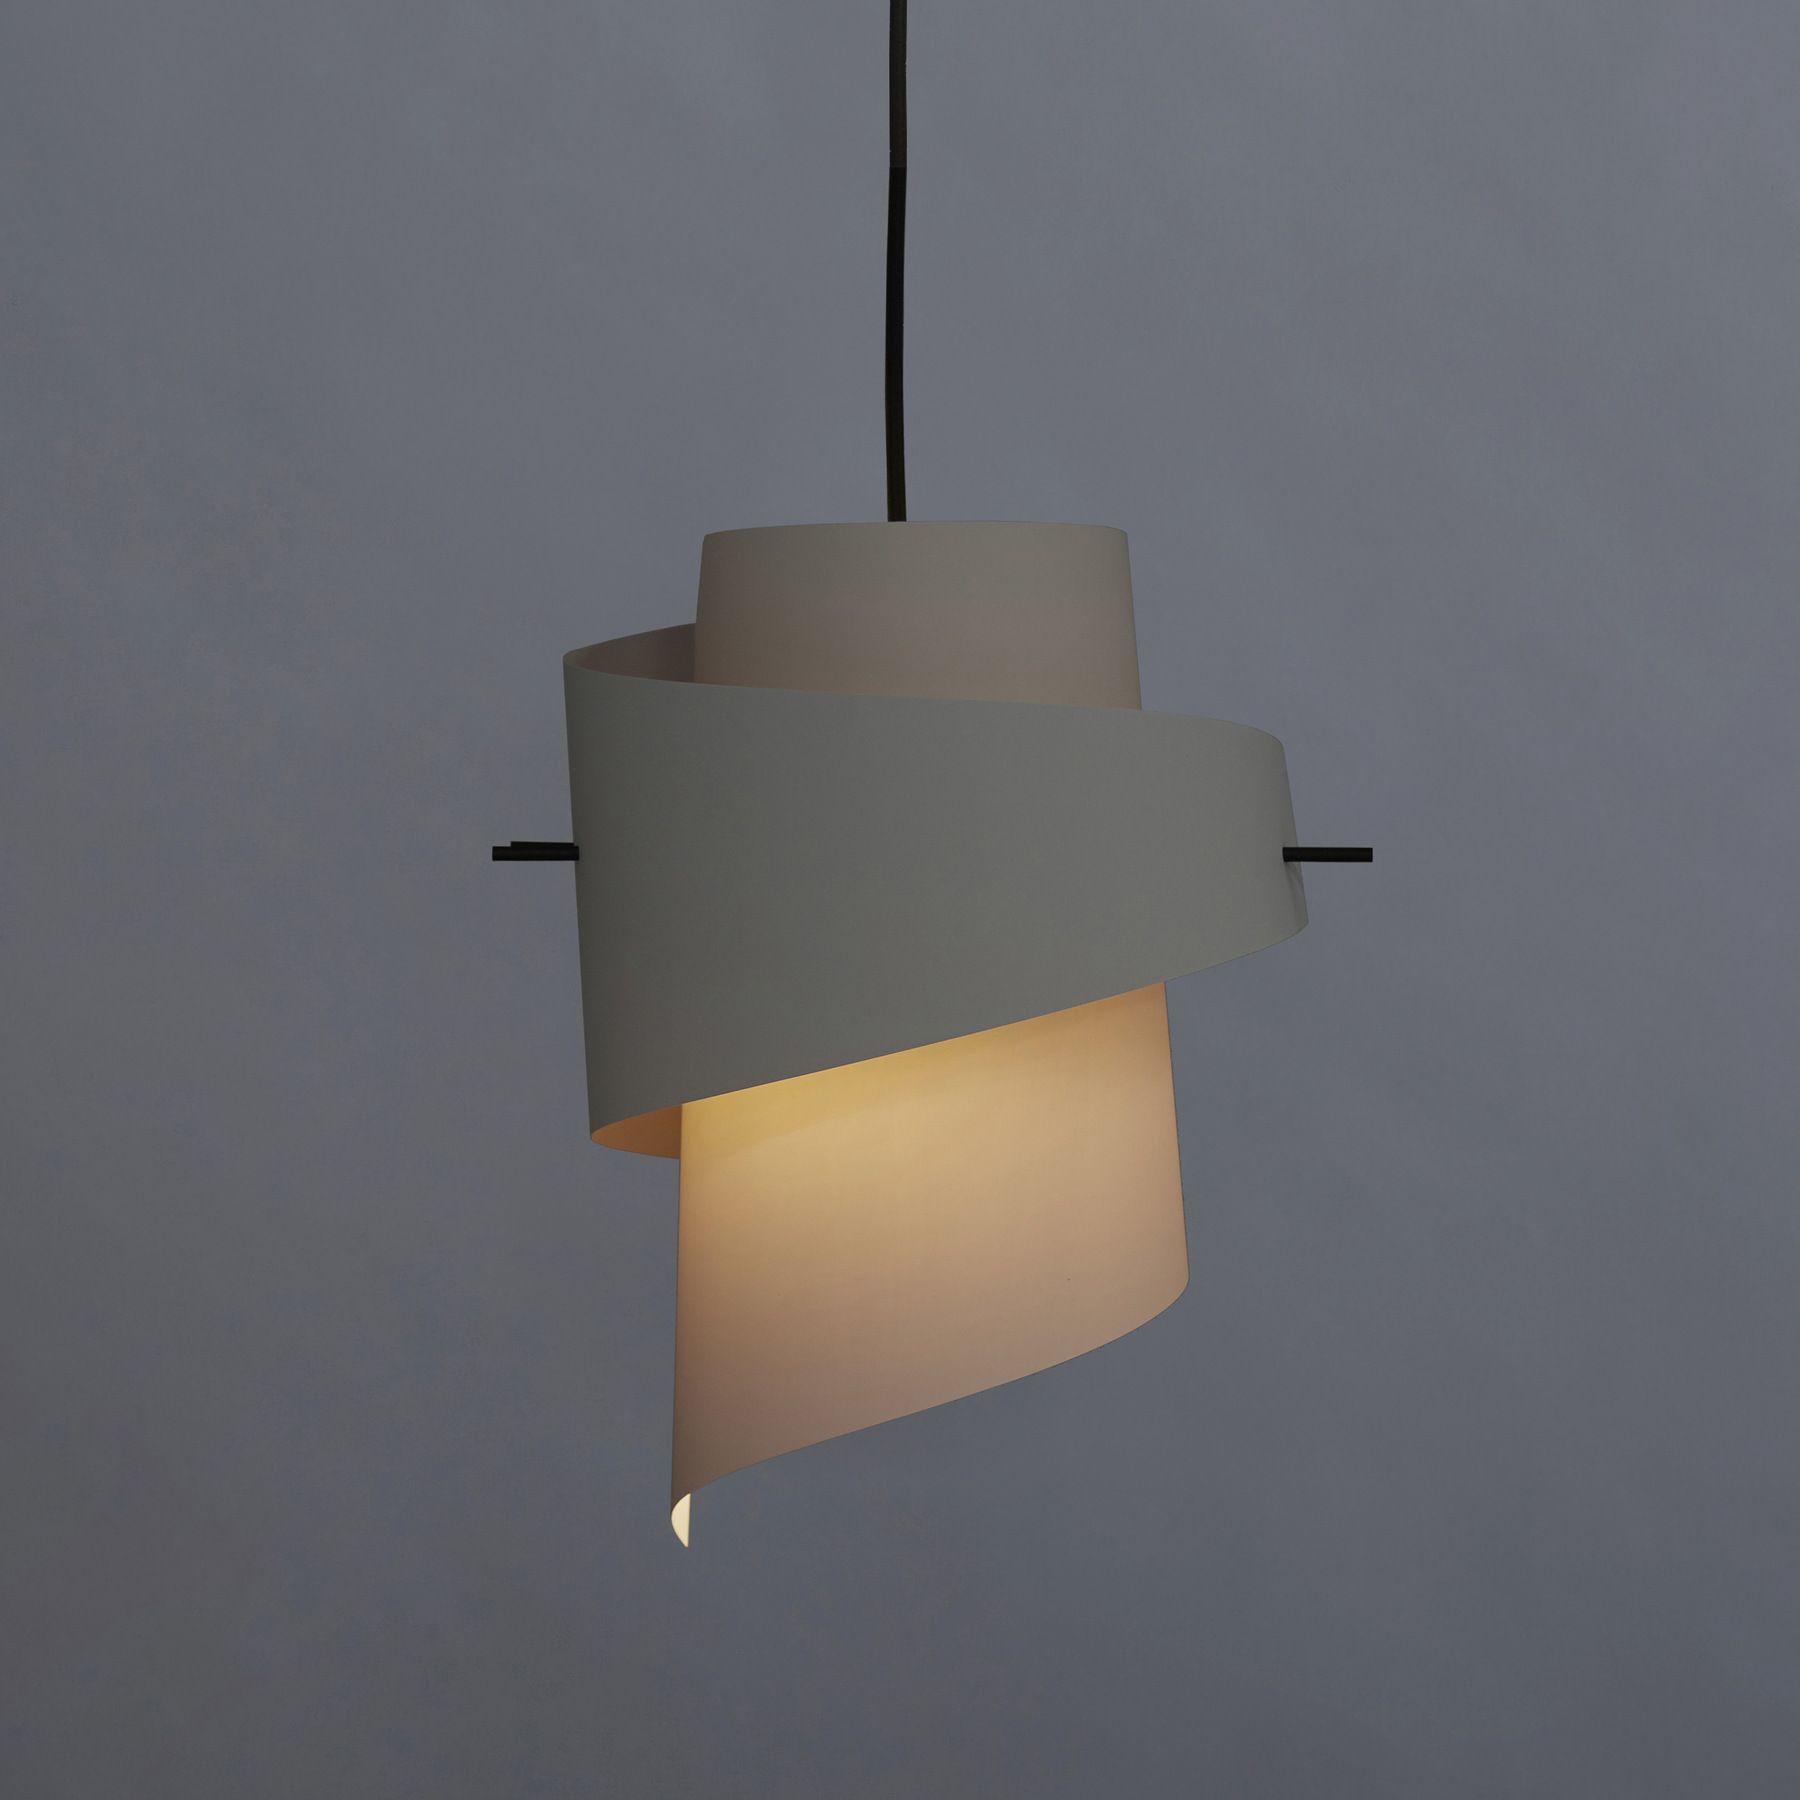 moijnmoijn - ML01_plastic_light grey with the light on